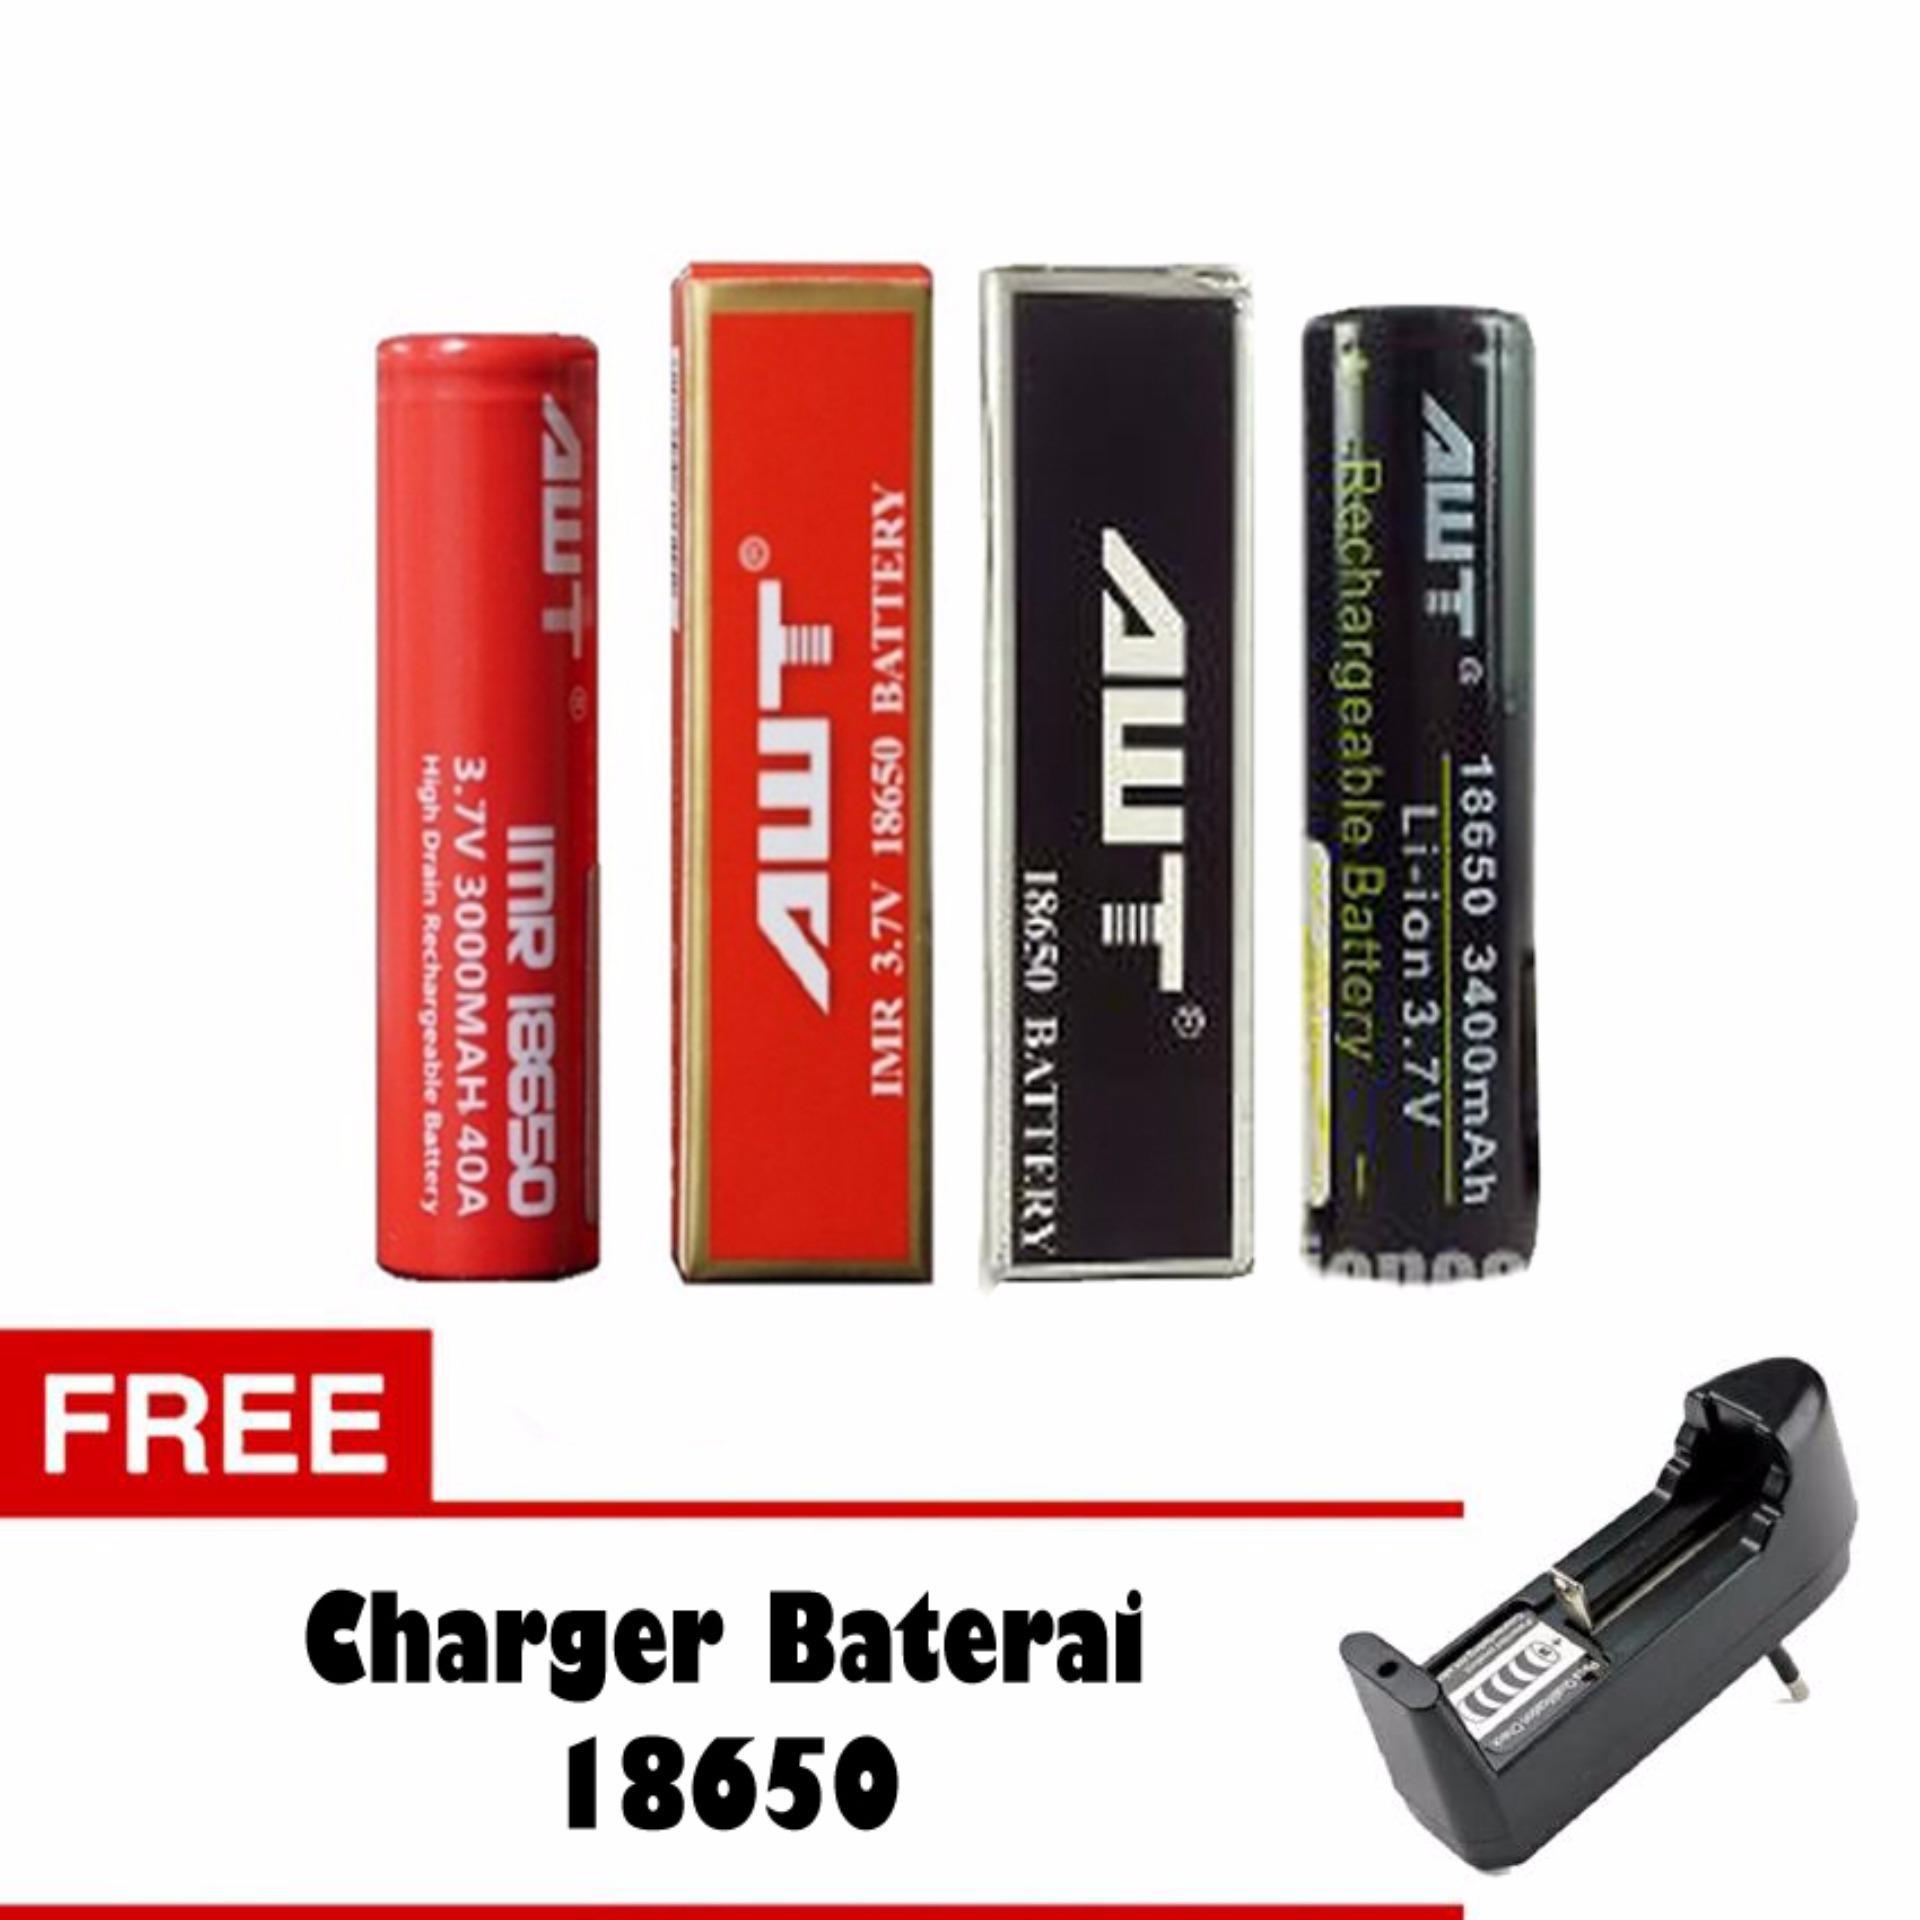 Eleaf Istick Pico Starter Kit 75w Rokok Elektrik Vape Vapor Free 1 Paket Ngebul Komplit Istik Fico Baterai Awt Hight Rechatable Hitam Dan Merah Charger